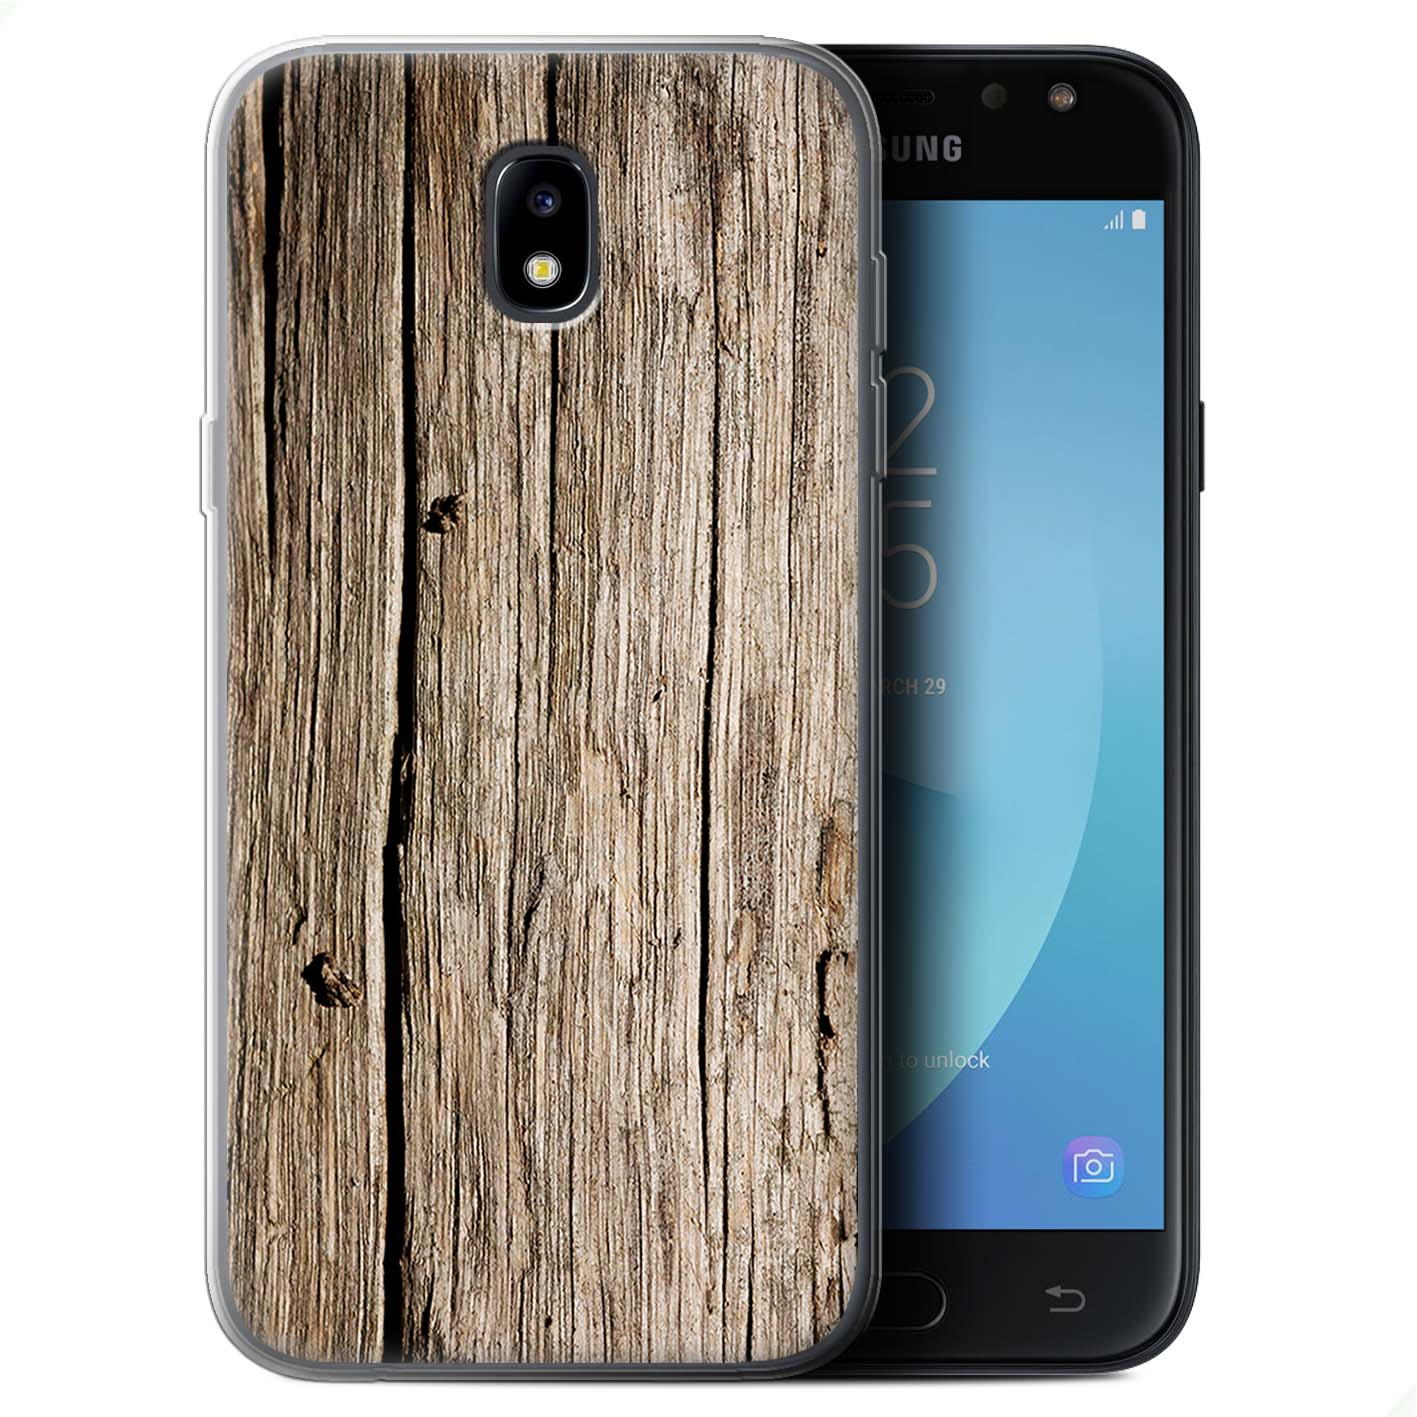 Gel-TPU-Case-Cover-for-Samsung-Galaxy-J7-2017-J730-Wood-Grain-Effect-Pattern